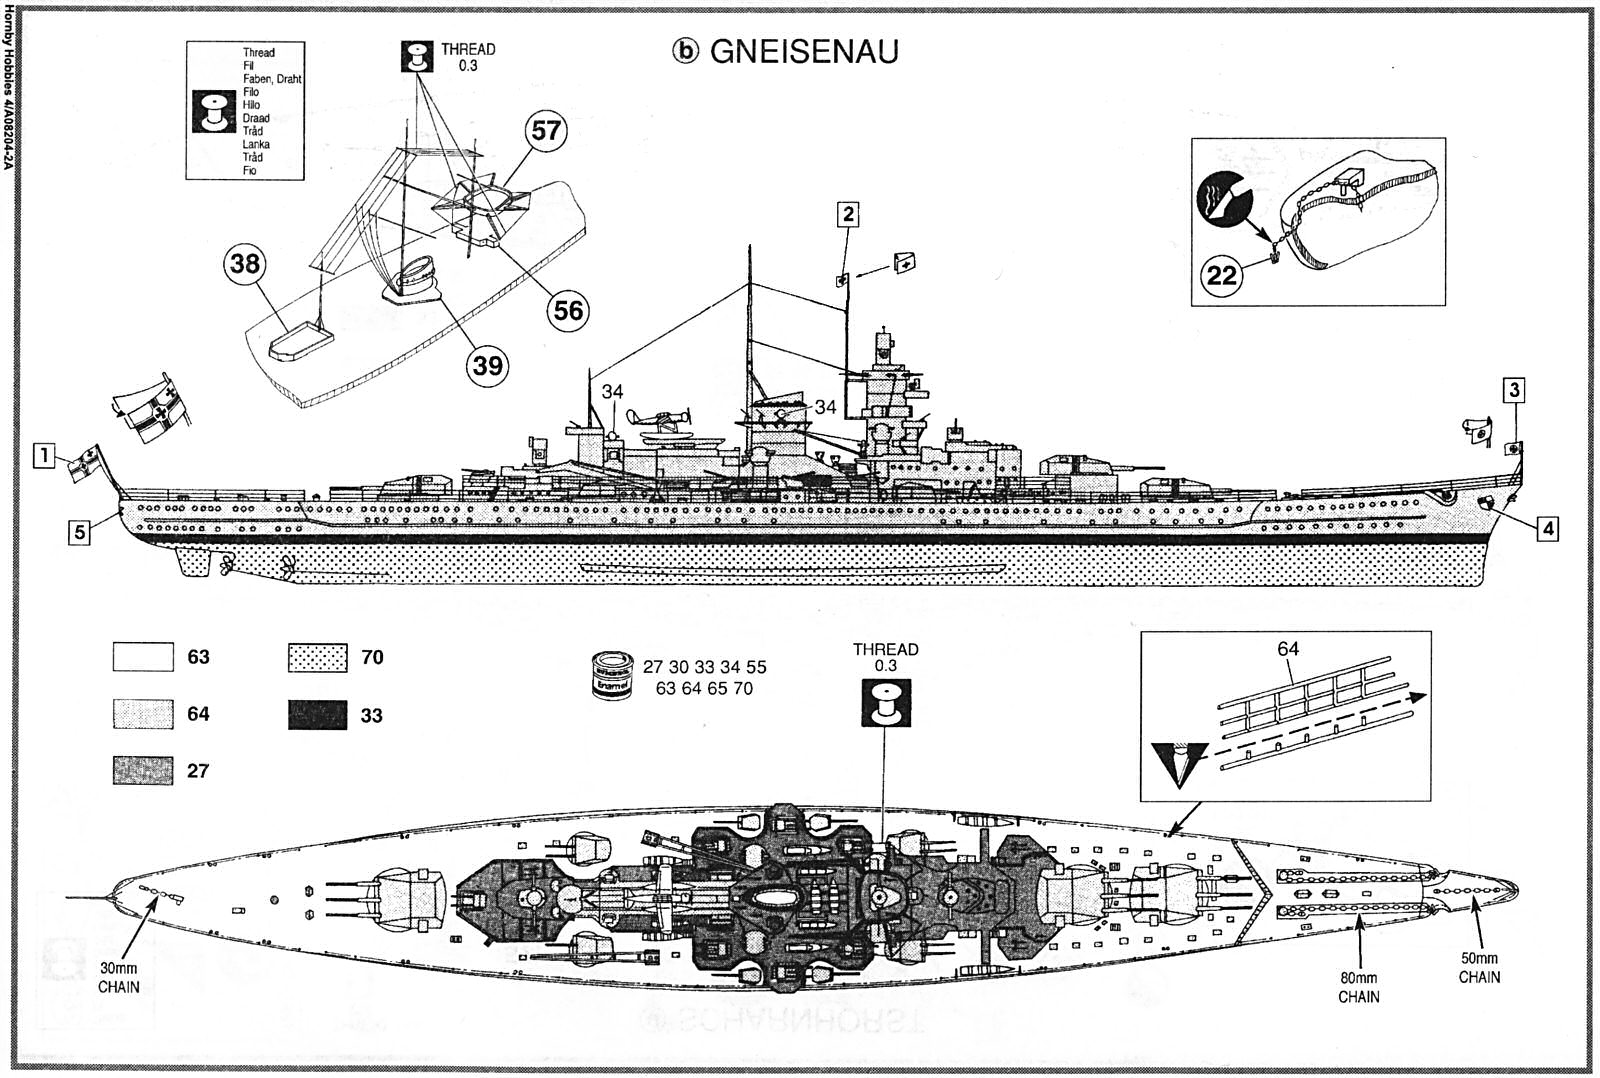 Airfix 1 400 Scharnhorst Or Gneisenau A